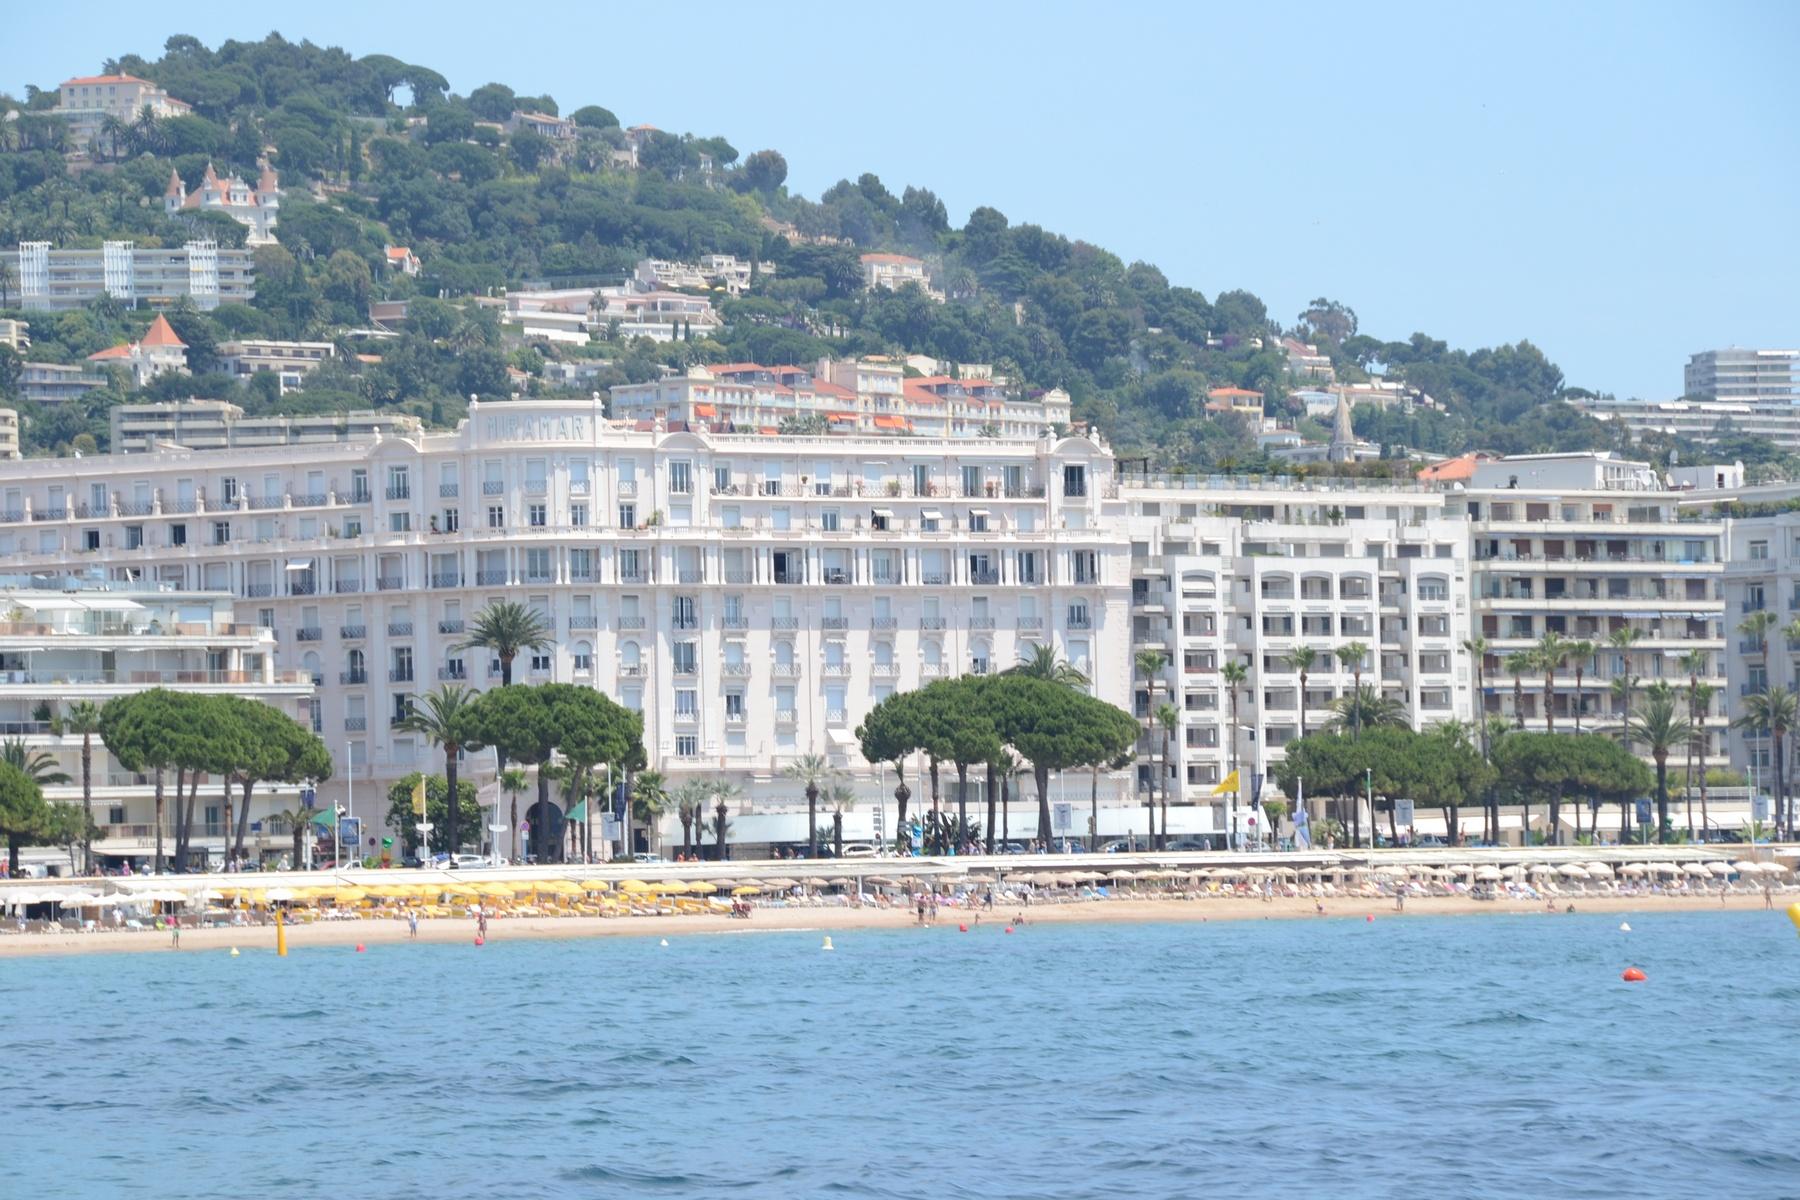 Miramar Hotel Cannes Cote d'Azur